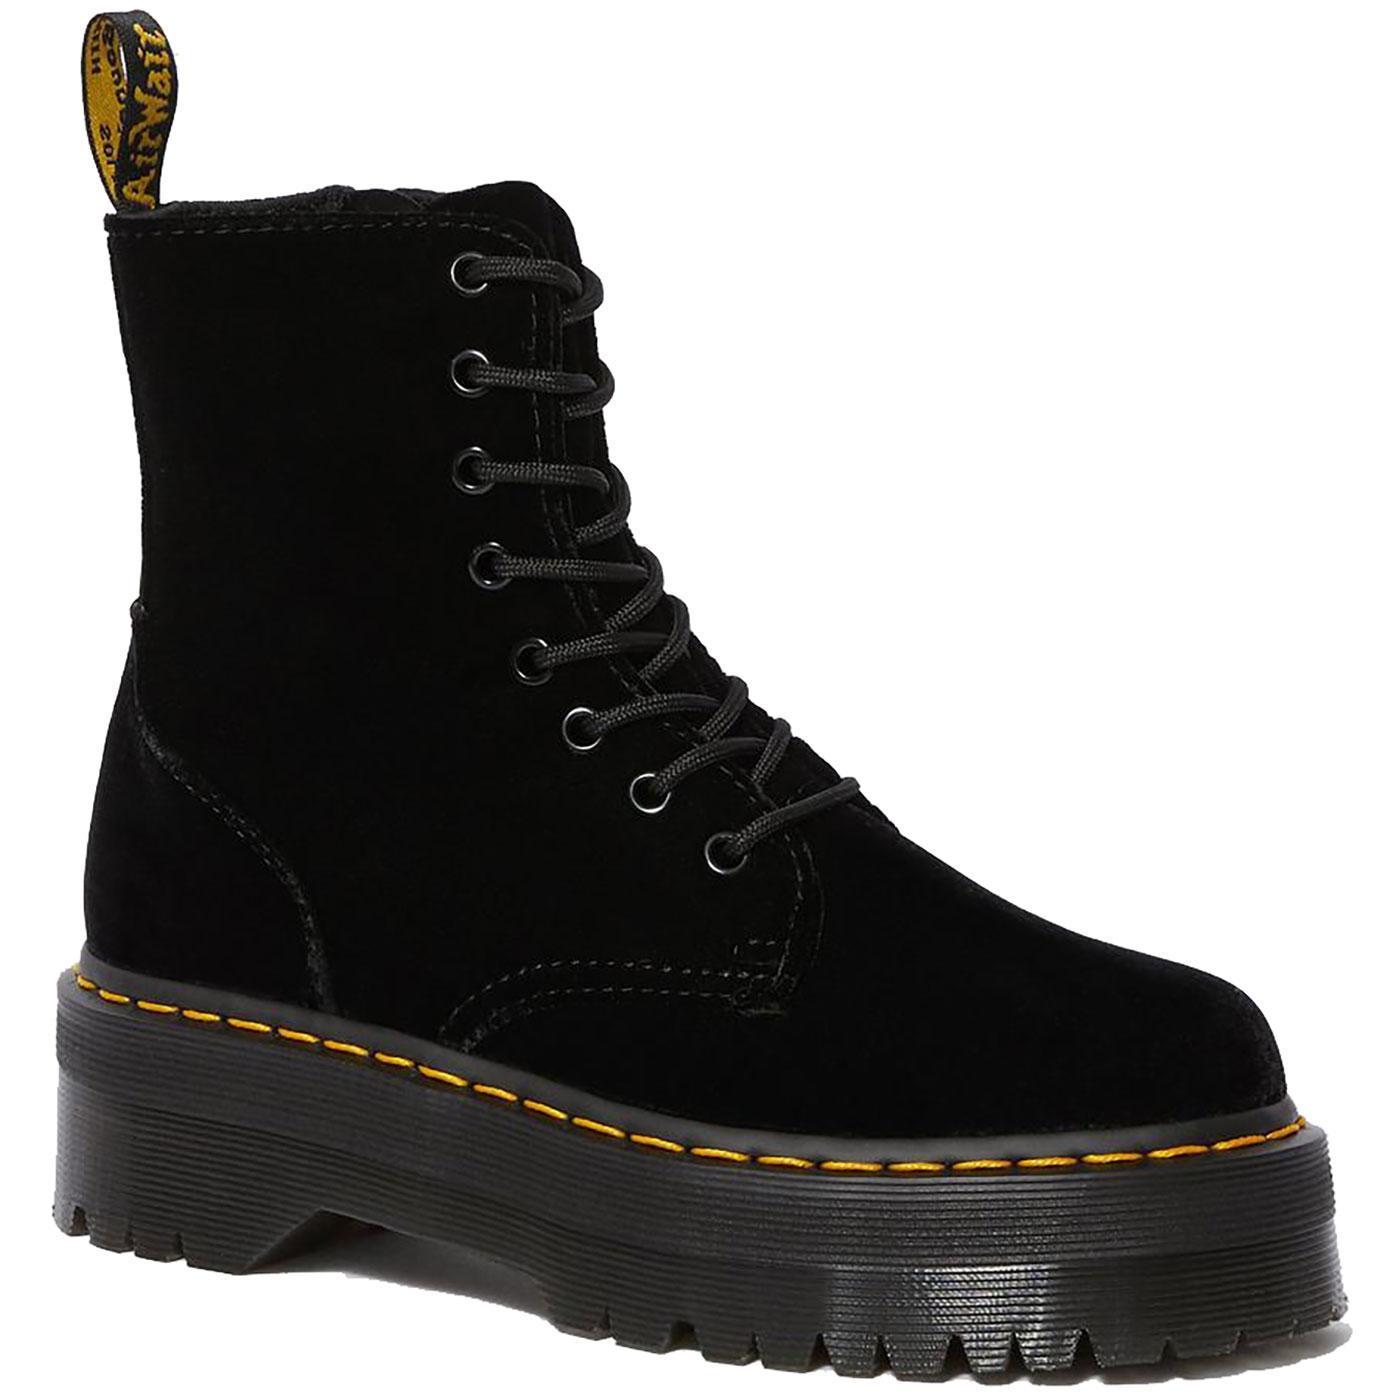 Jadon DR MARTENS Women's 70s Velvet Platform Boots